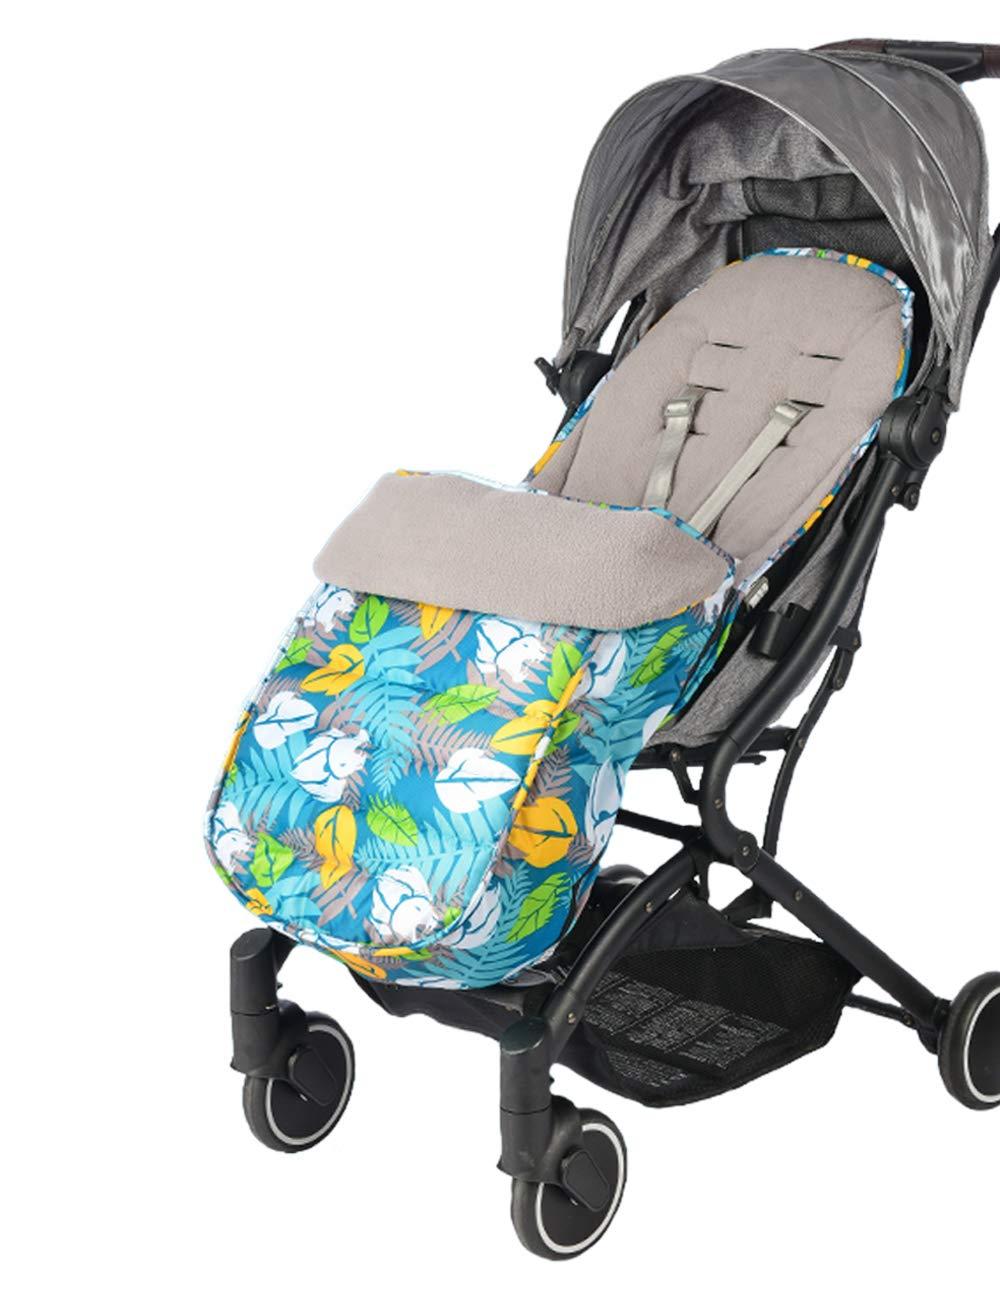 JFBABY Outdoor Stroller Bunting Bag, Universal 3 in 1 Winter Outdoor Tour Toddler Universal Stroller Sleeping Bag, Cold-Proof Detachable&Temperature Regulation Footmuff for Stroller (Type B)